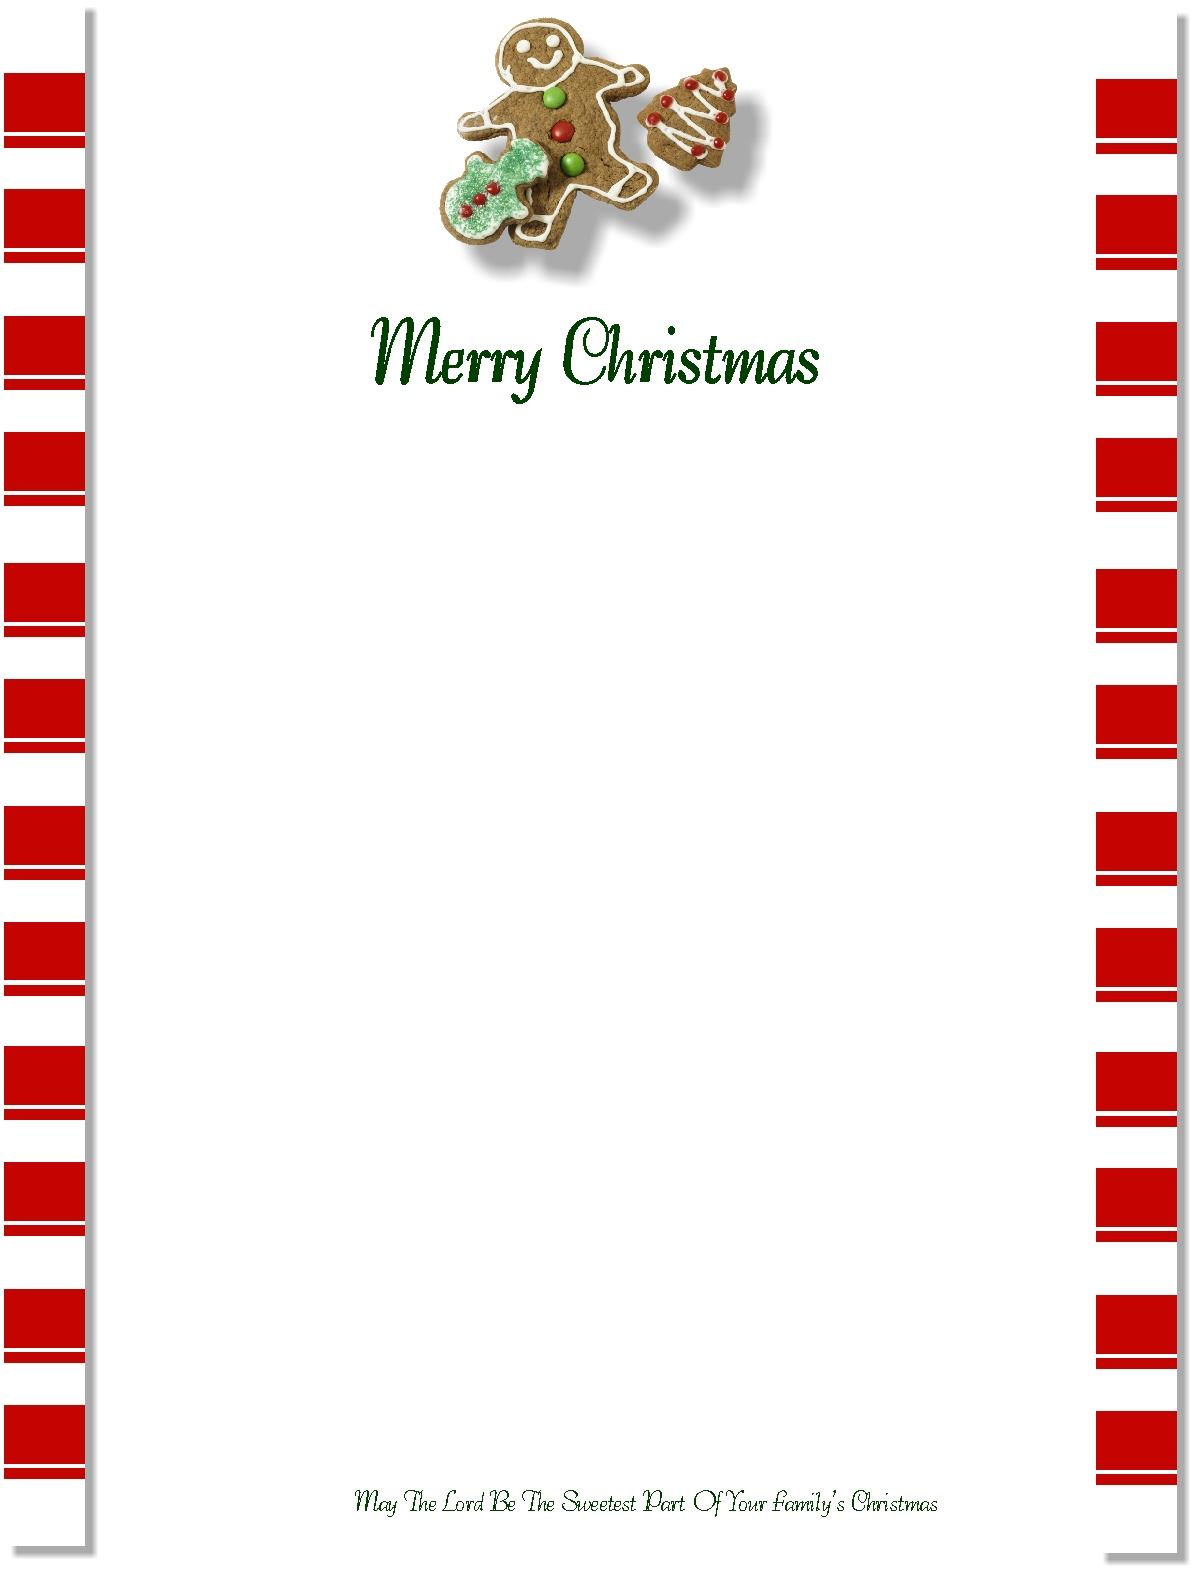 Free printable stationary borders joy studio design gallery best design for Holiday letterheads